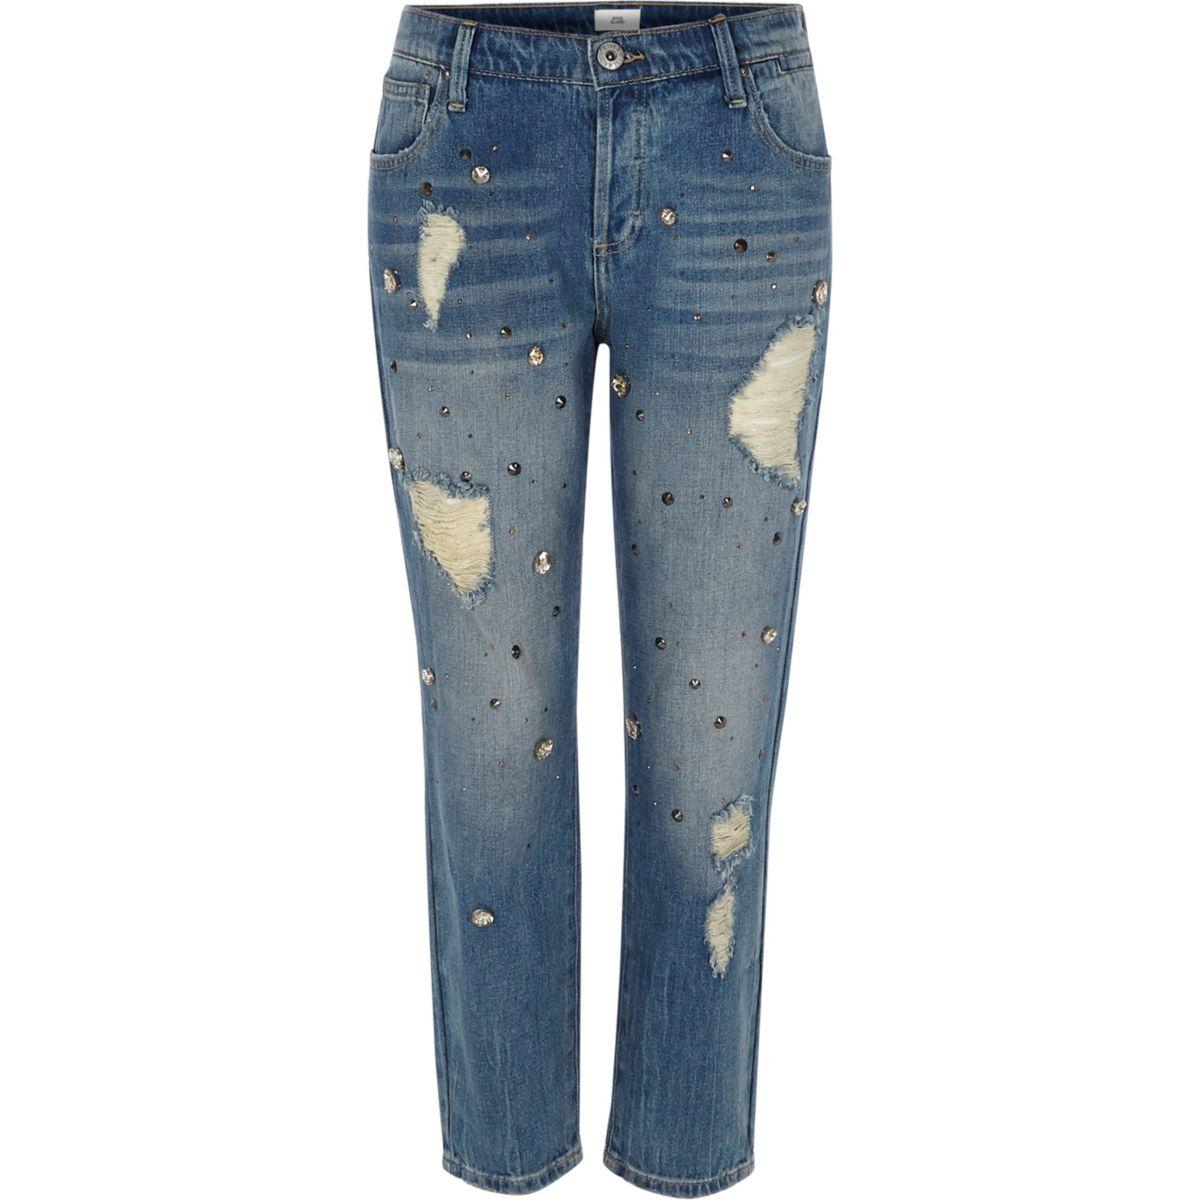 Middenblauwe denim versierde boyfriend jeans